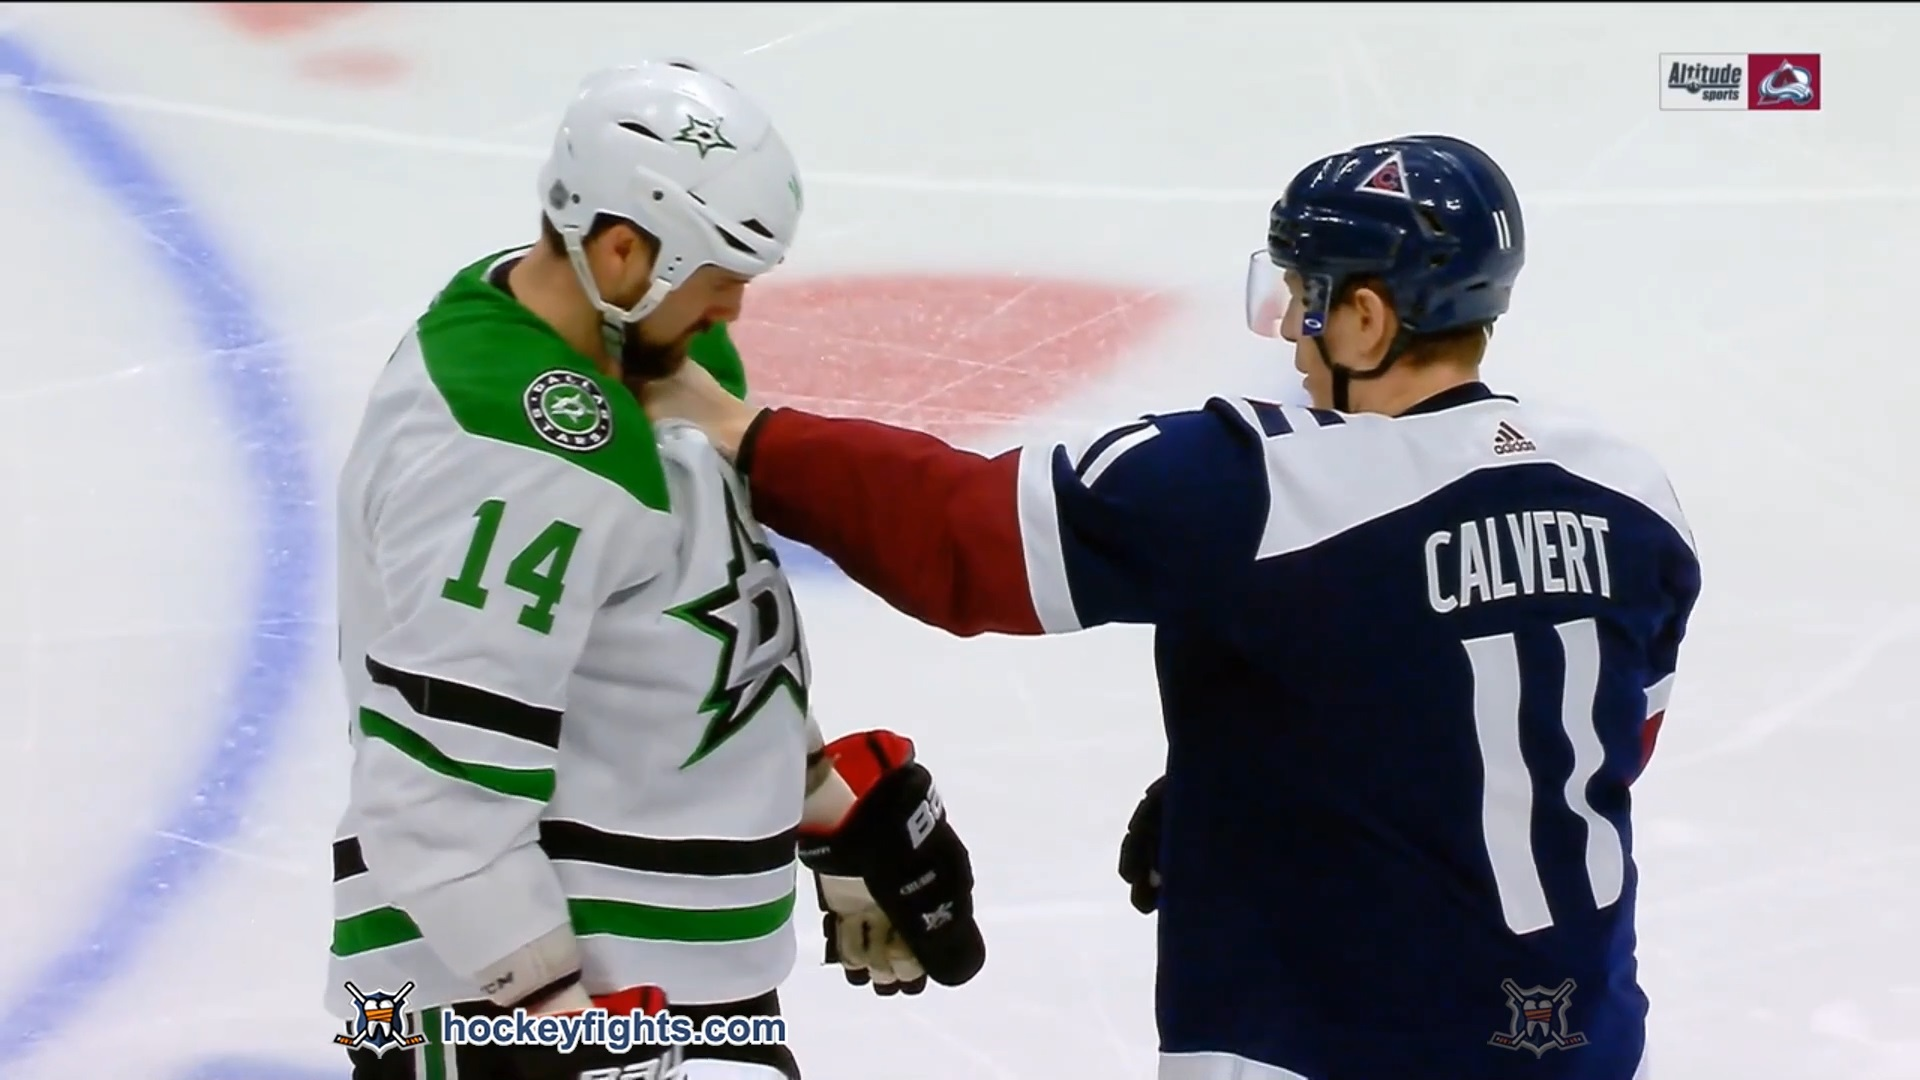 Matt Calvert vs. Jamie Benn